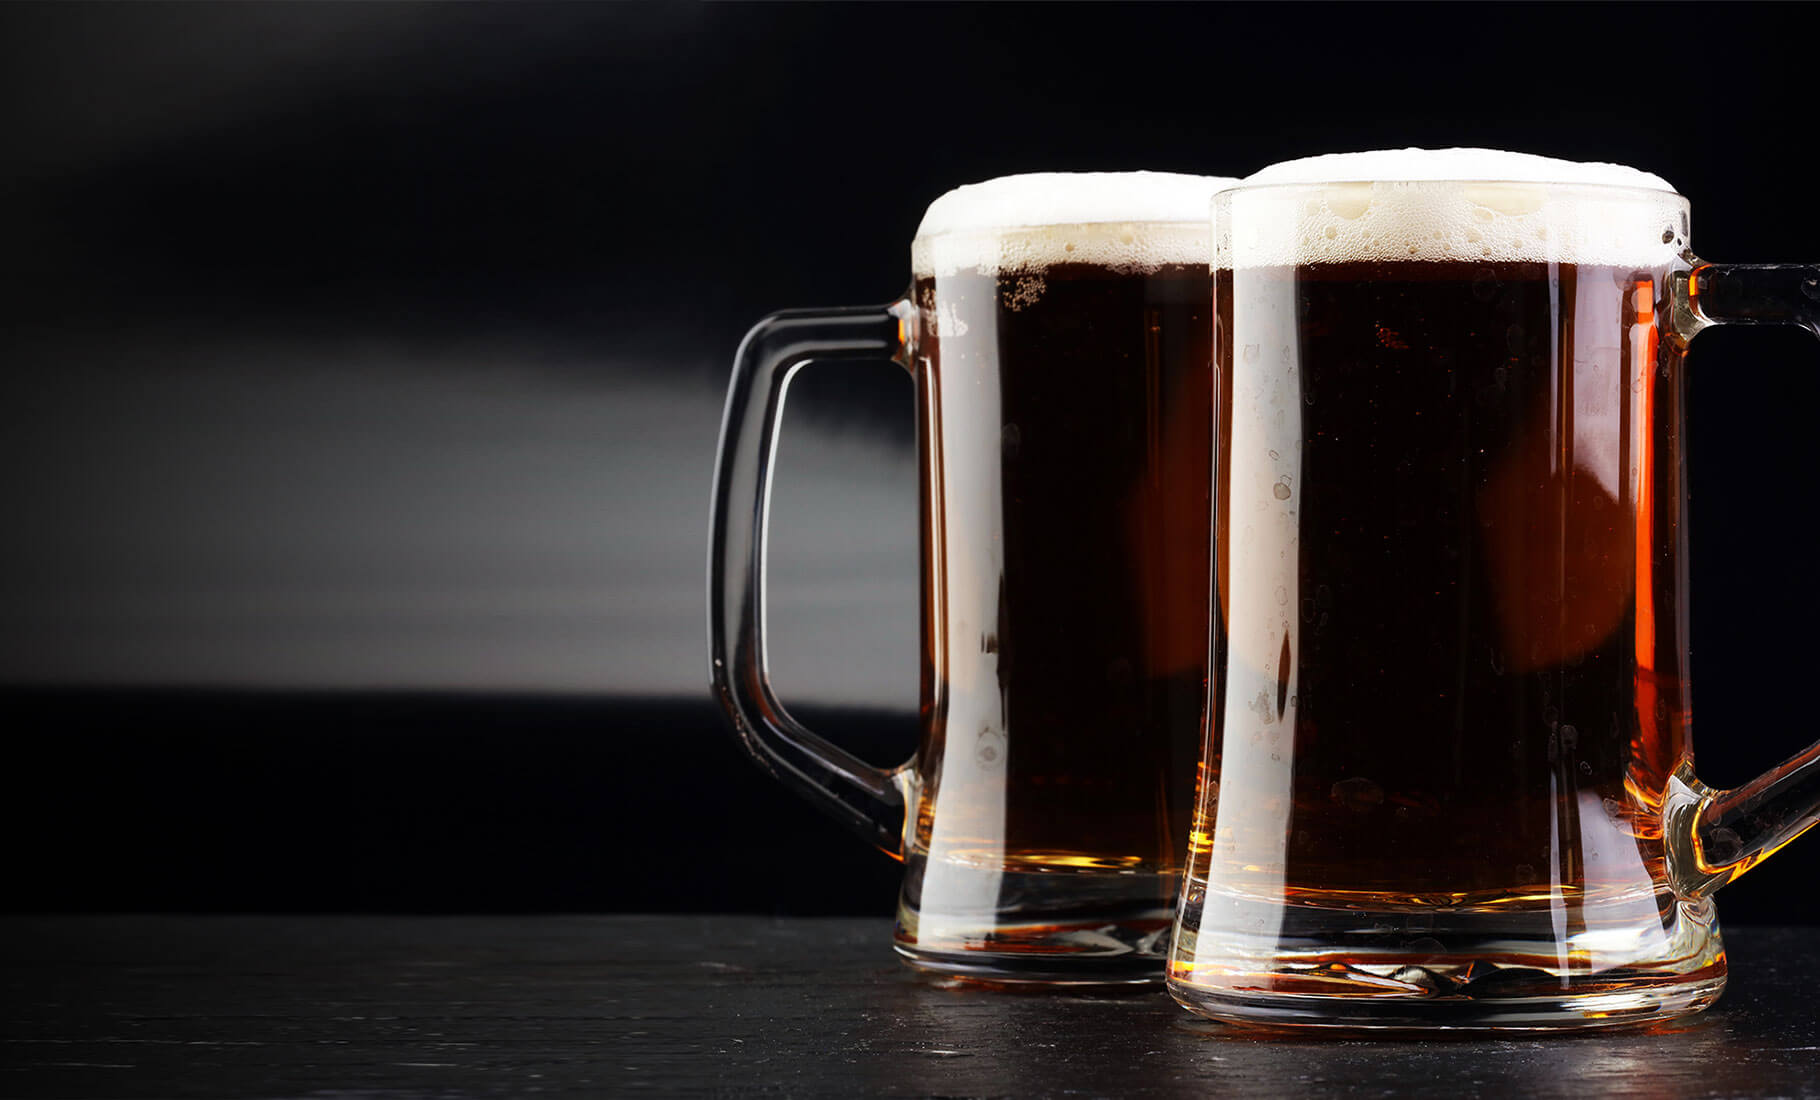 American Brown Ale in a Mug